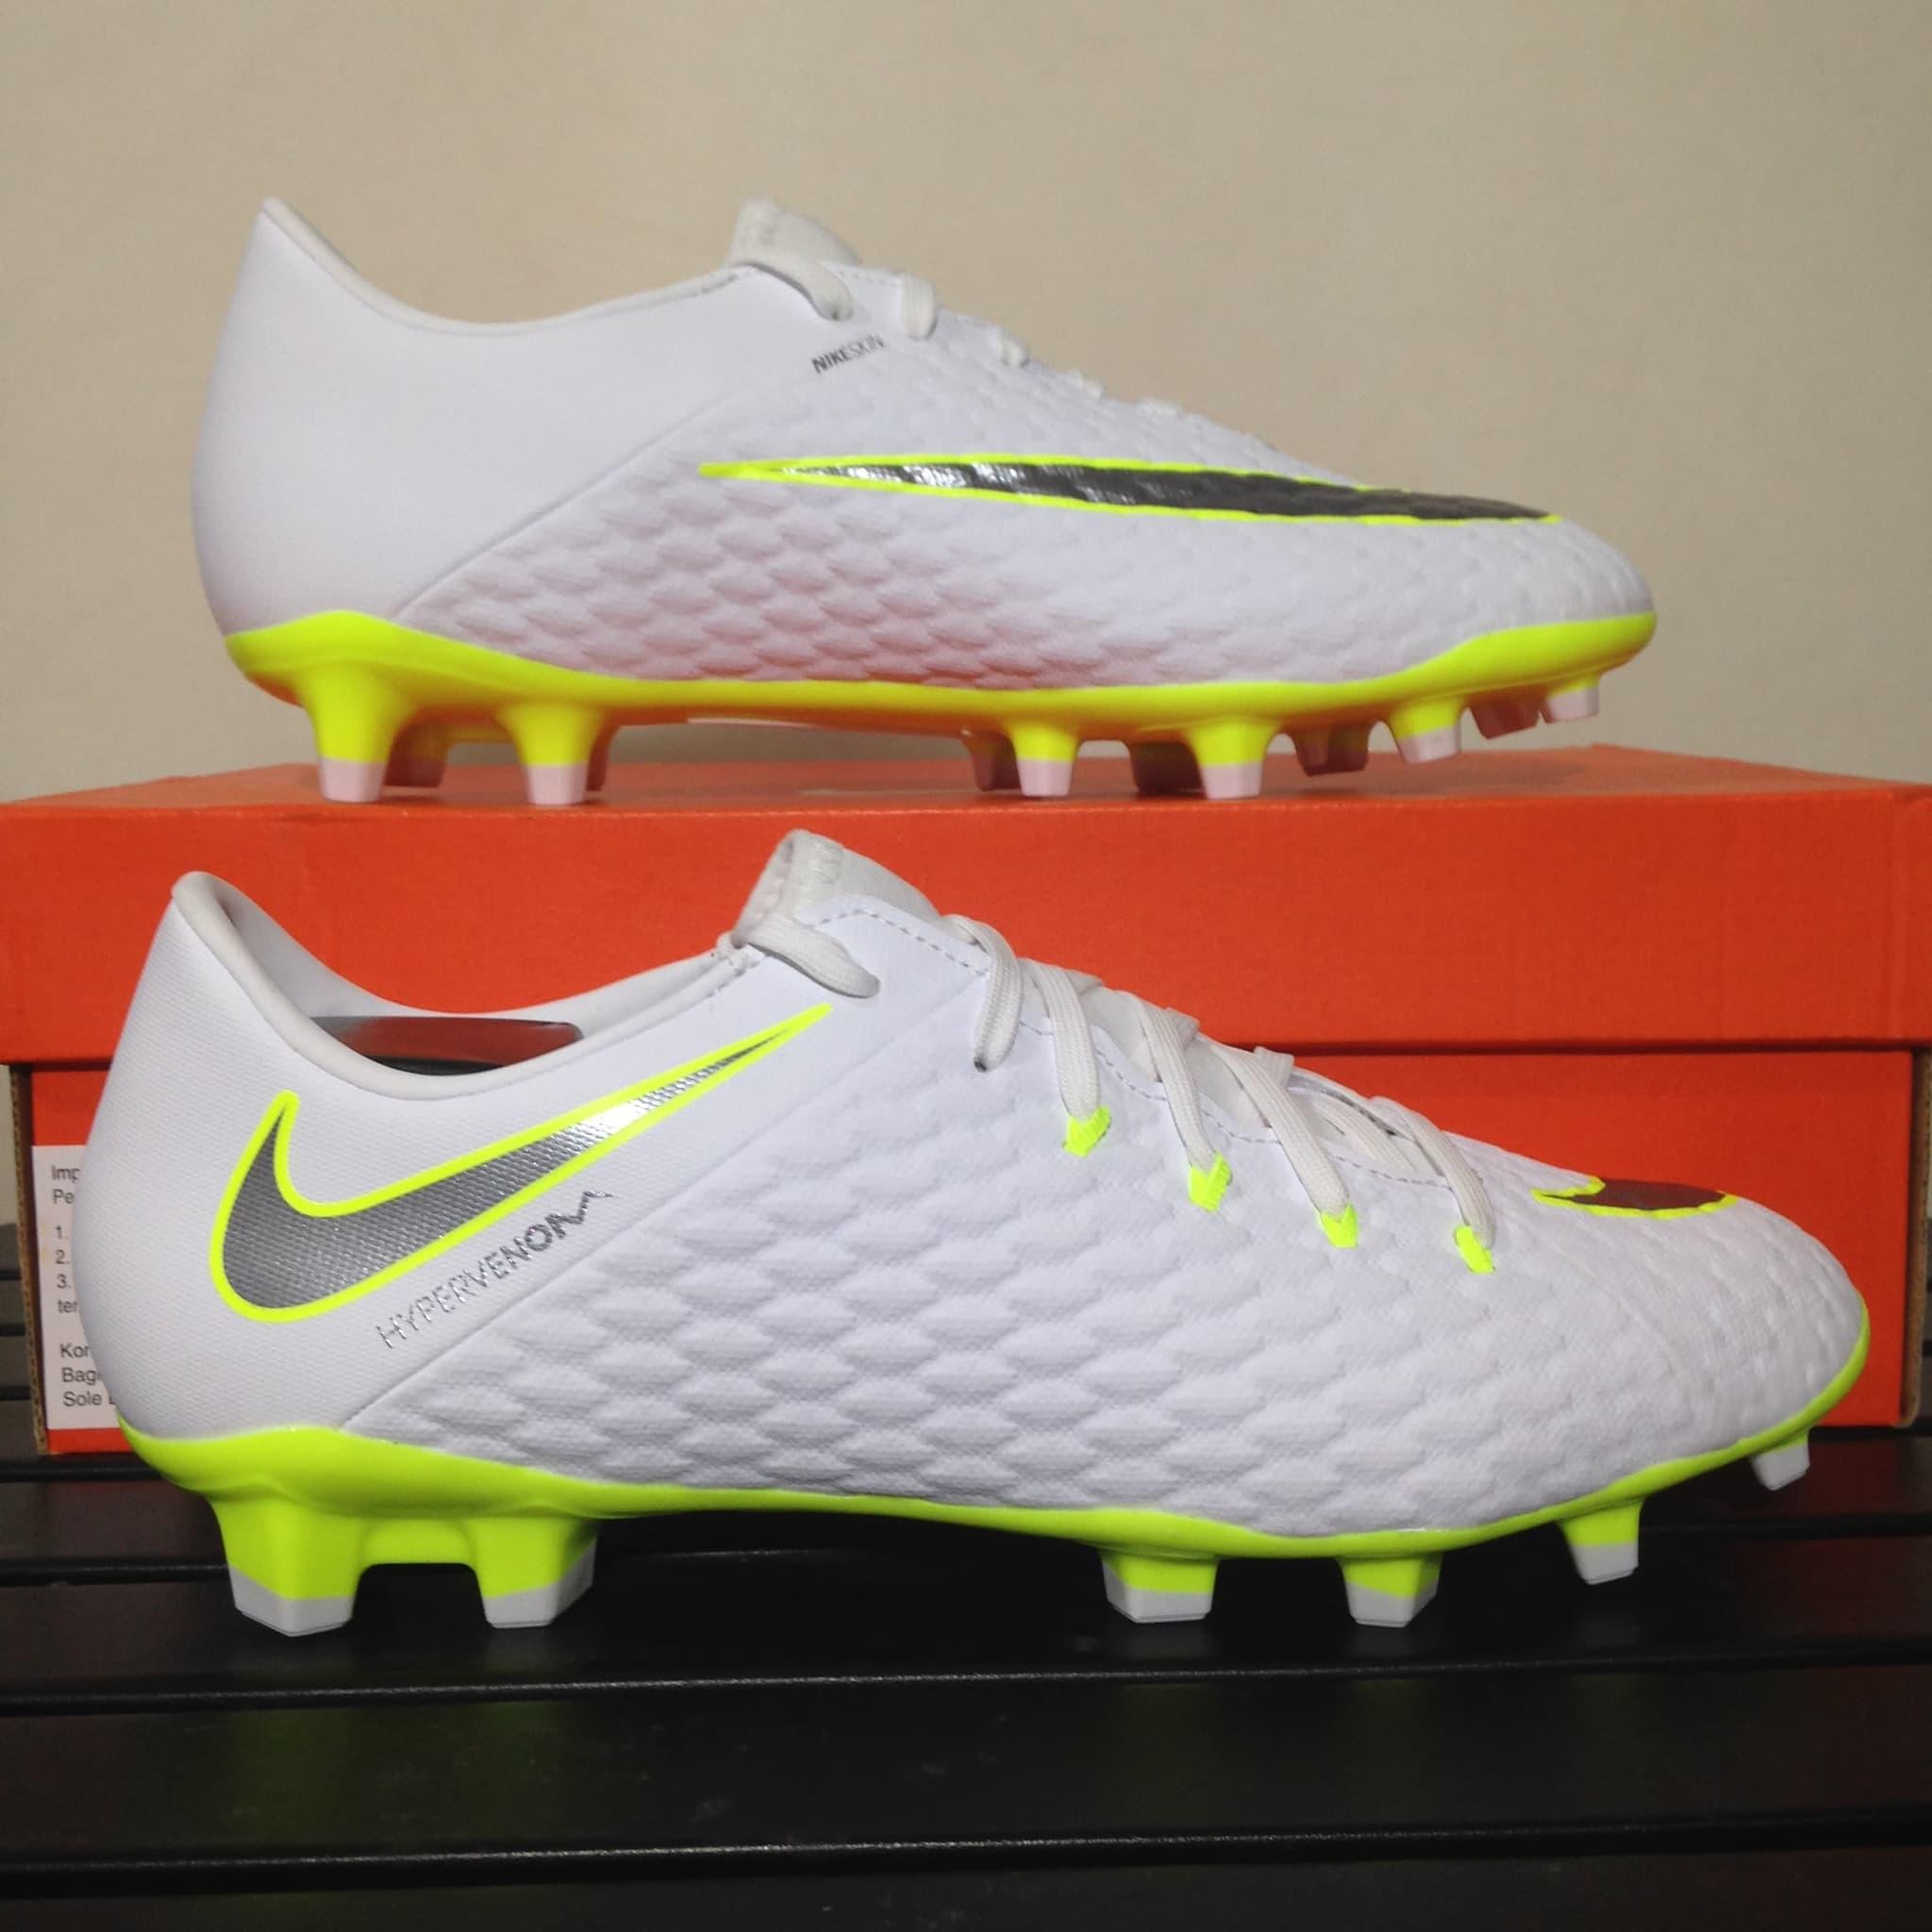 a6fb82c20ee4 Jual Sepatu Bola Nike Hypervenom 3 Academy Fg White Volt Aj4120 ...